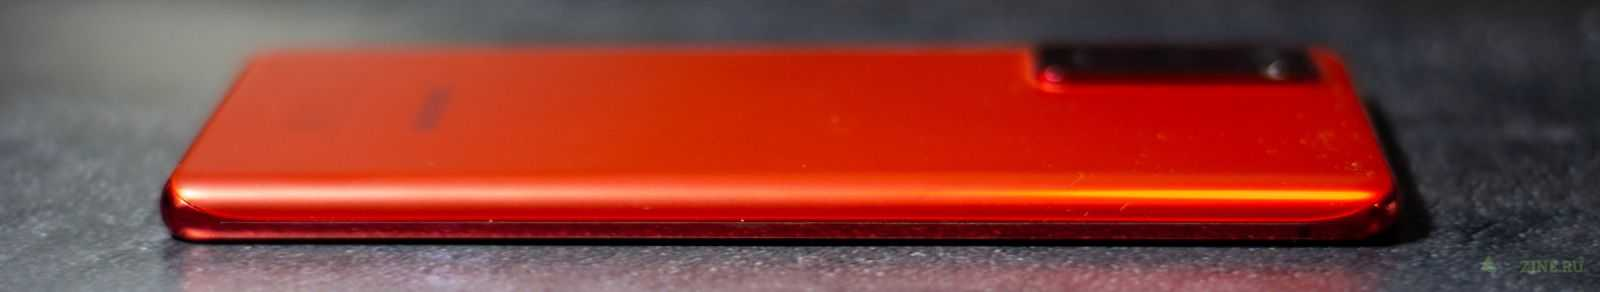 Обзор Samsung Galaxy S20 FE: недорогой, но флагман (DSC 9779)